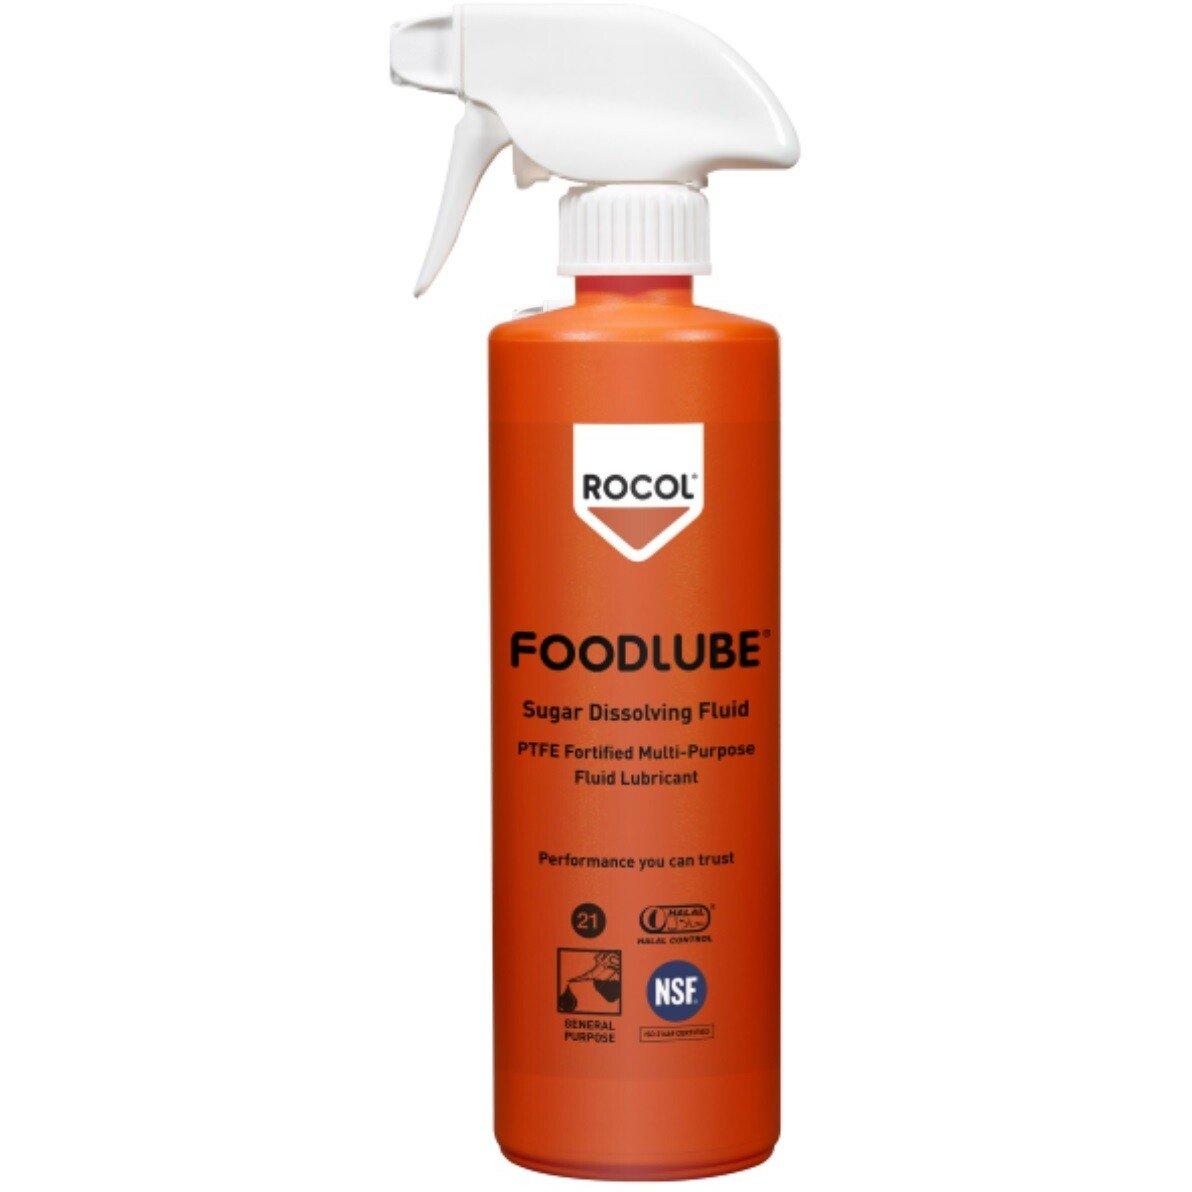 Rocol 15110 Foodlube Sugar Dissolving Fluid (NSF Registered) 500ml